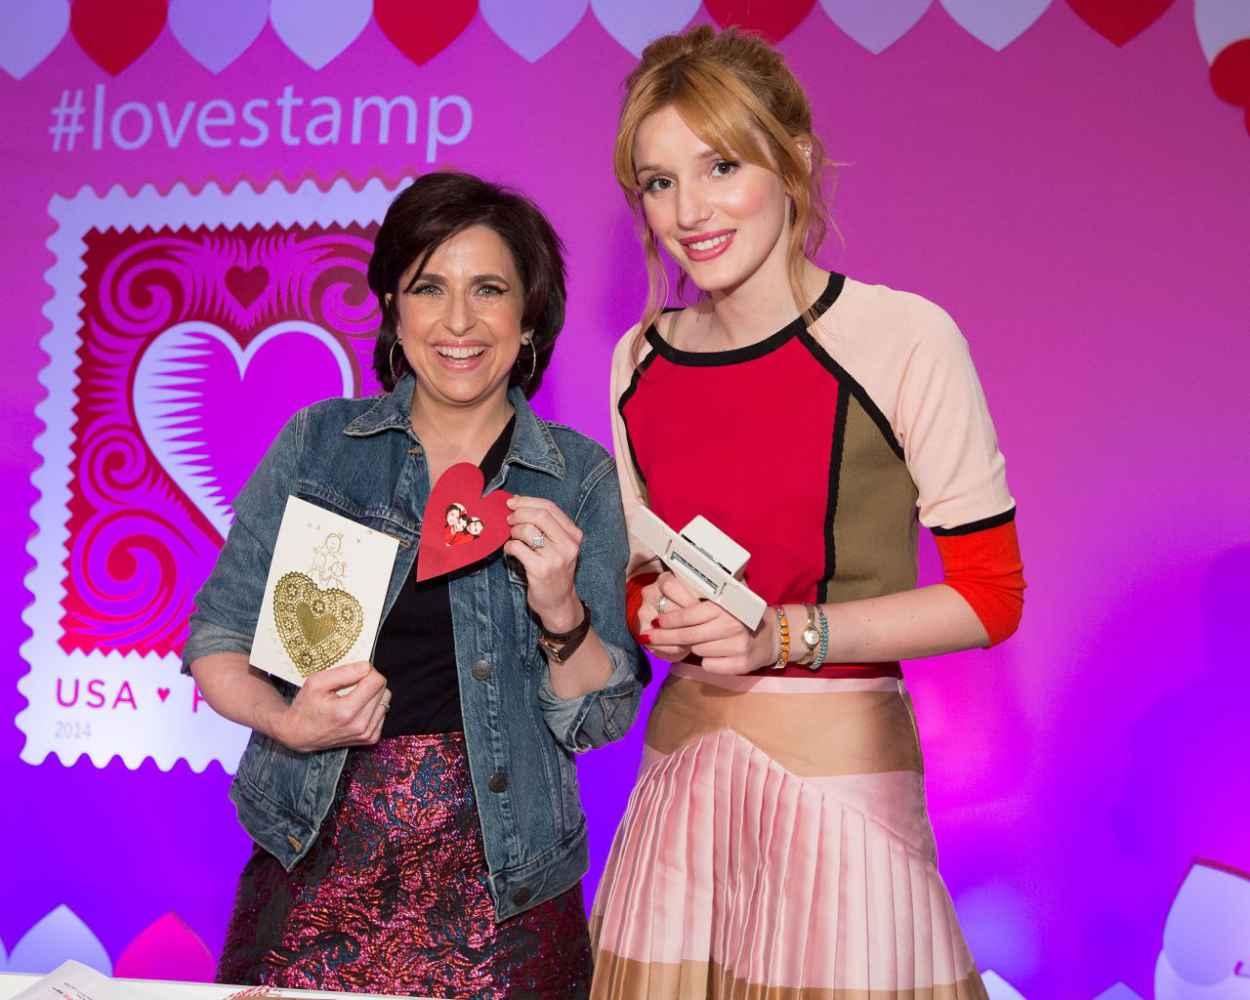 Bella Thorne - United States Postal Service Love Stamp 2015 - January 2015-1